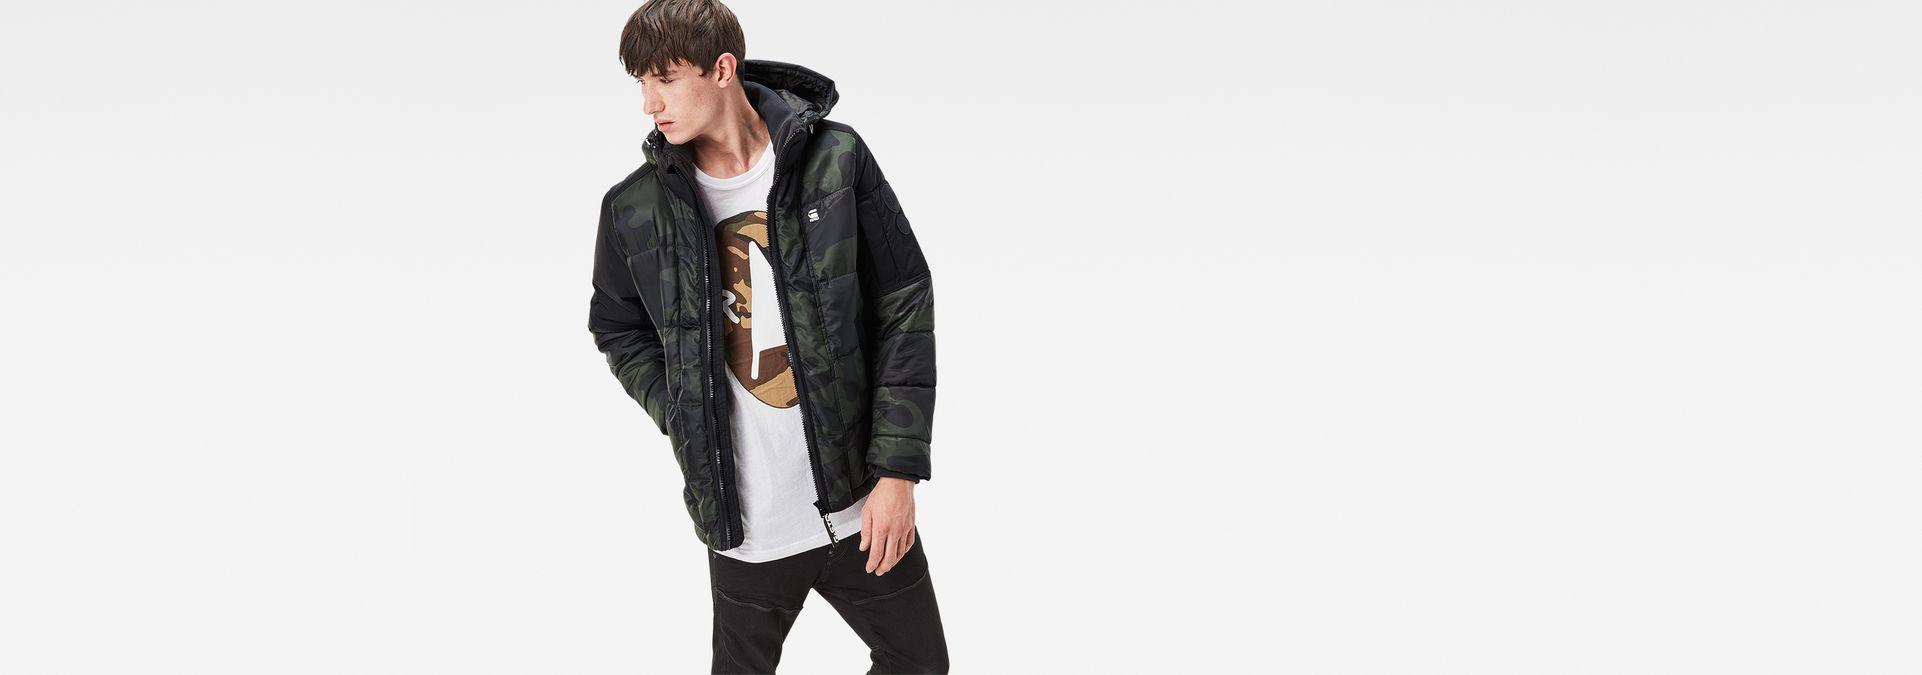 6407249fbd504 Whistler Hooded Camo Jacket | Asfalt/Carbon | Men | G-Star RAW®